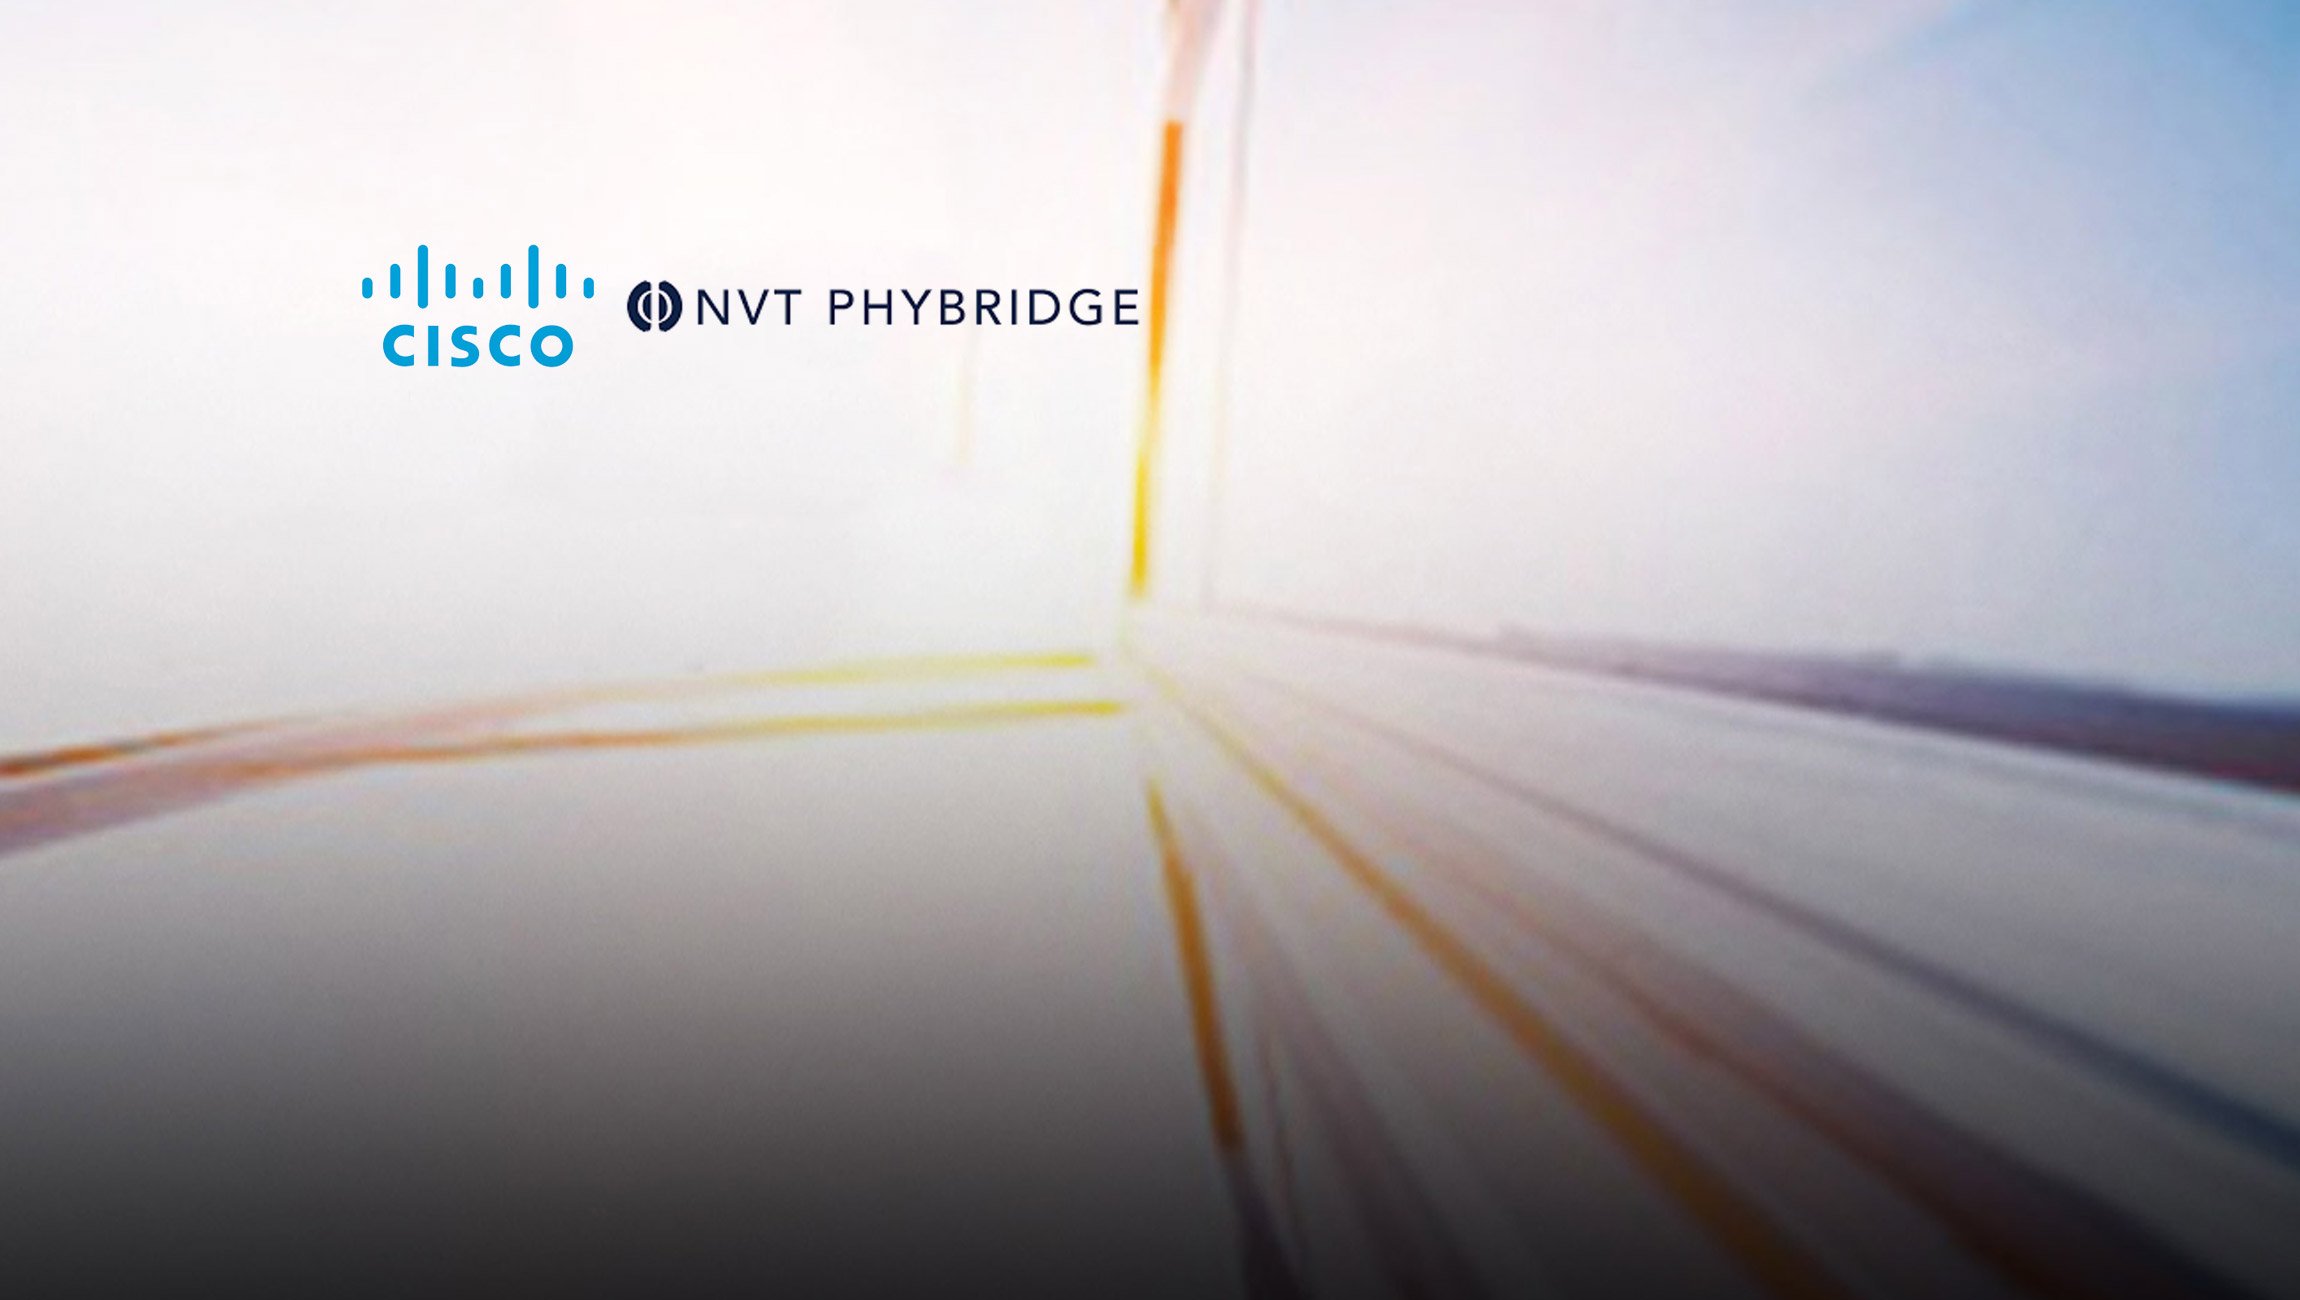 Cisco Adds Game-Changing NVT Phybridge PoLRE Switch to the Cisco Black Belt Academy